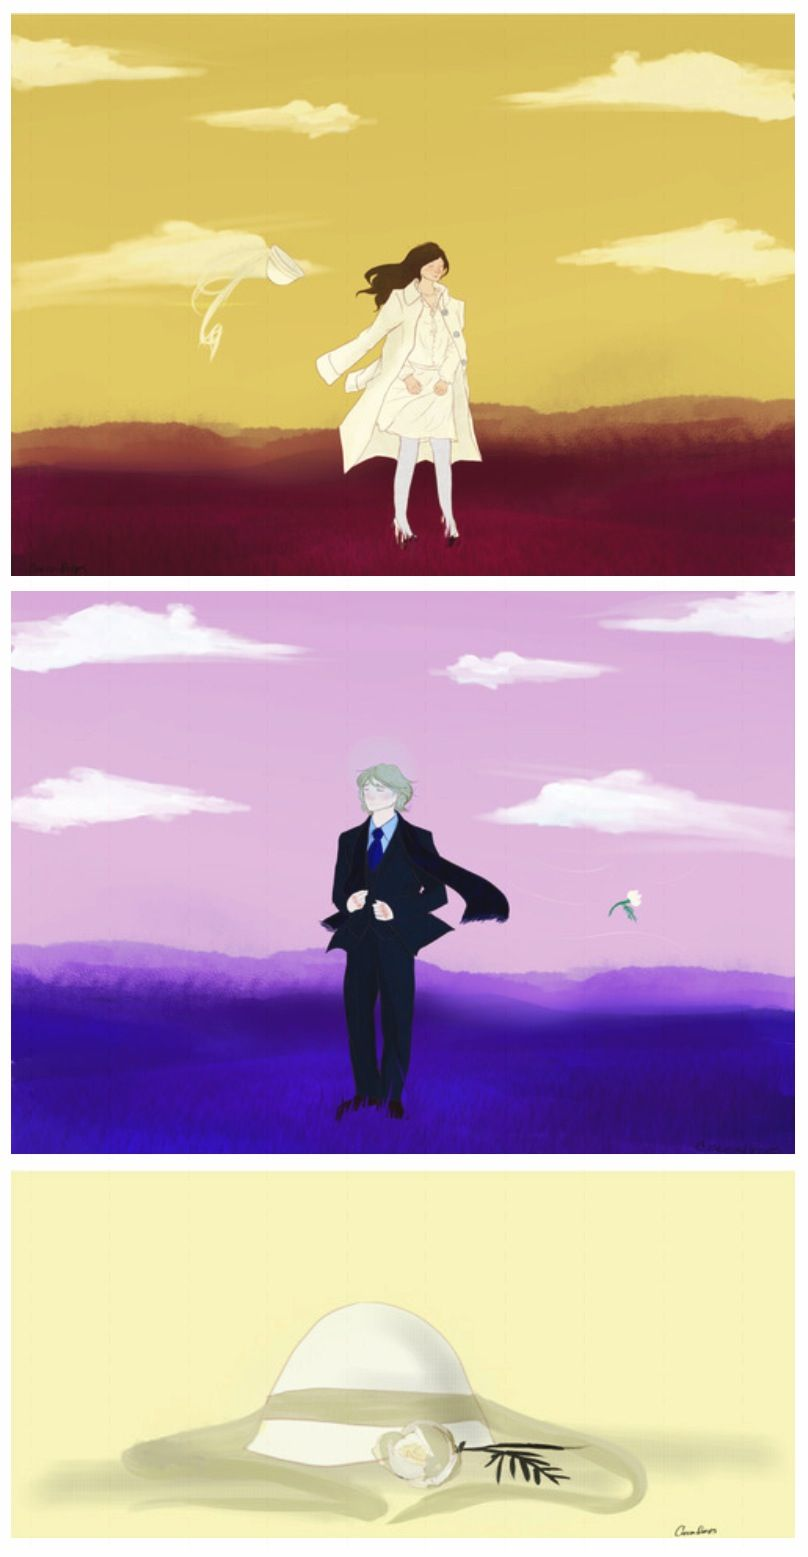 Rumbelle wedding by euphoriapotion on tumblr